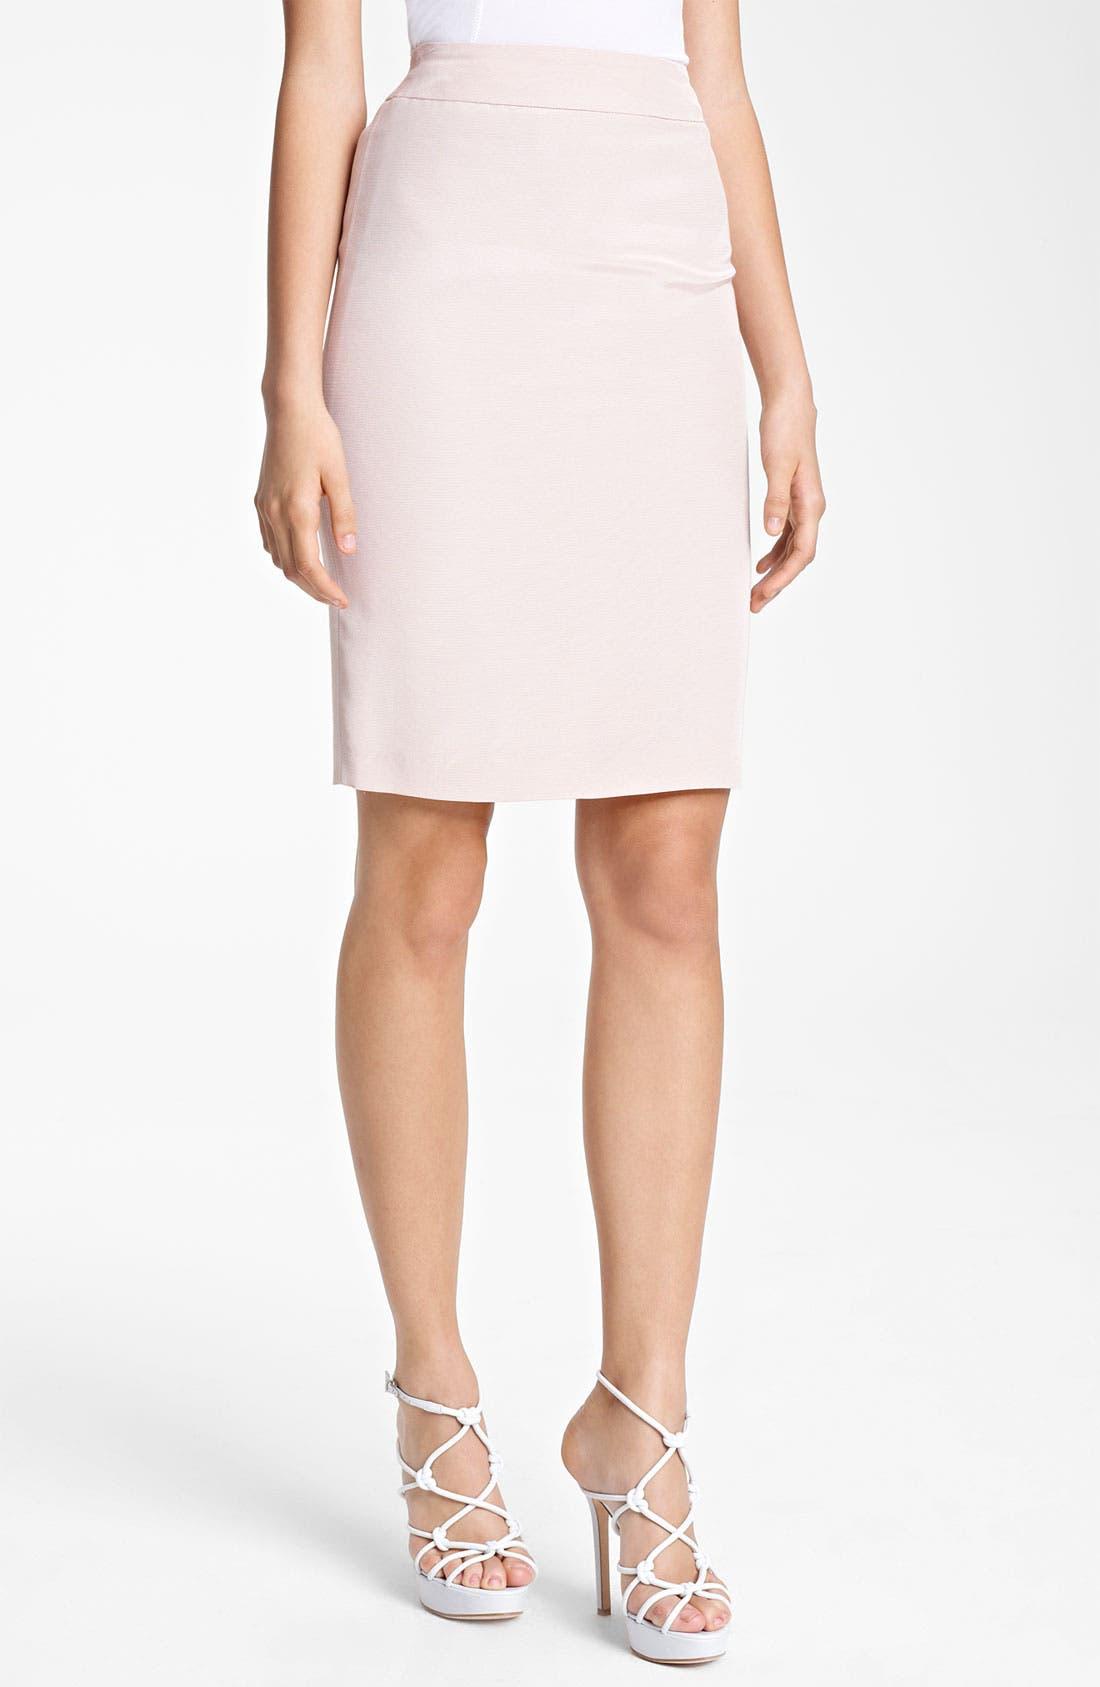 Alternate Image 1 Selected - Armani Collezioni Faille Pencil Skirt